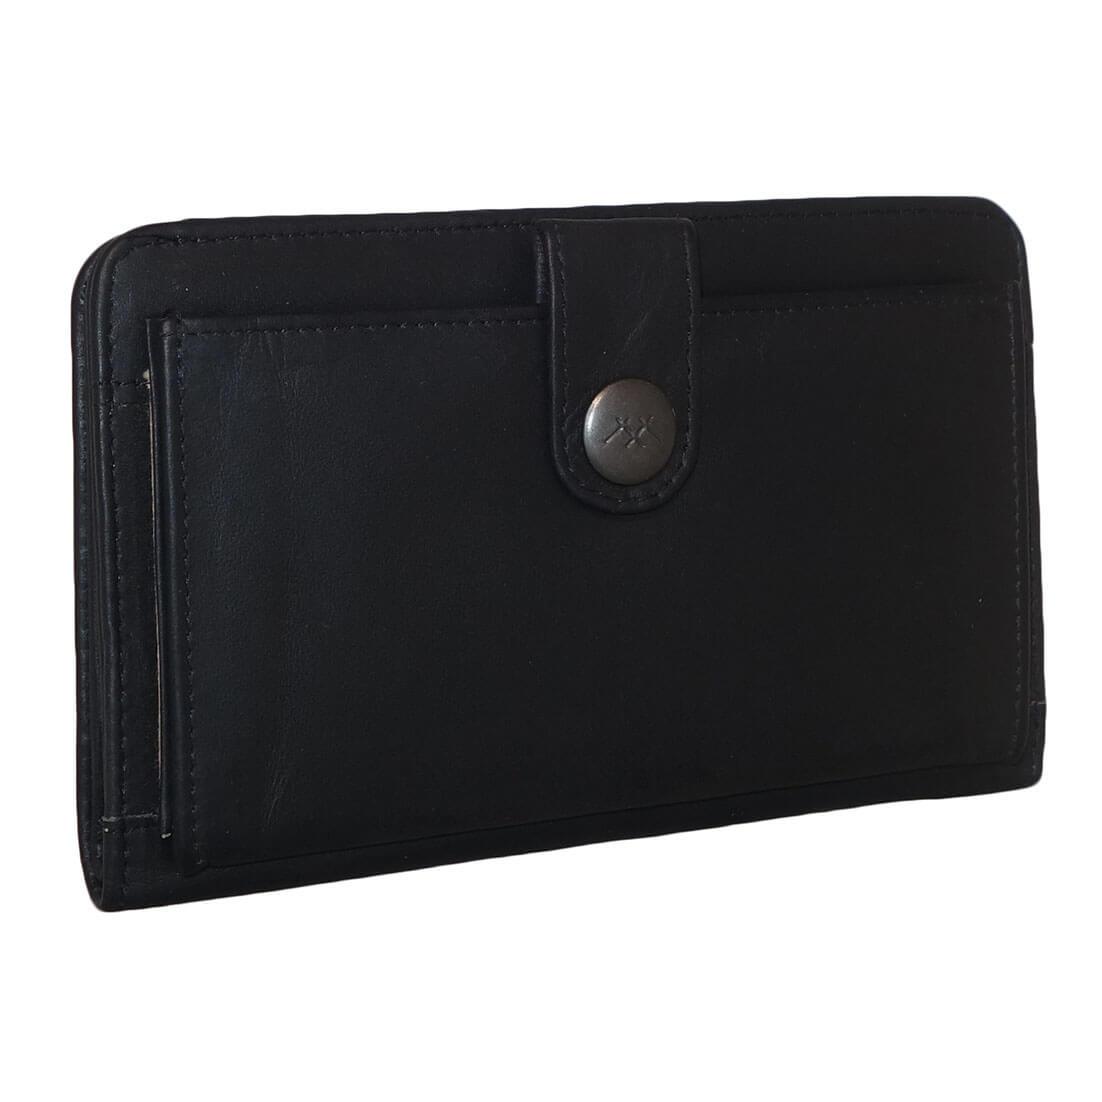 4a442909a48 ... MicMacbags RFID Portemonnee met Smartphone Vak Zwart-19338 ...